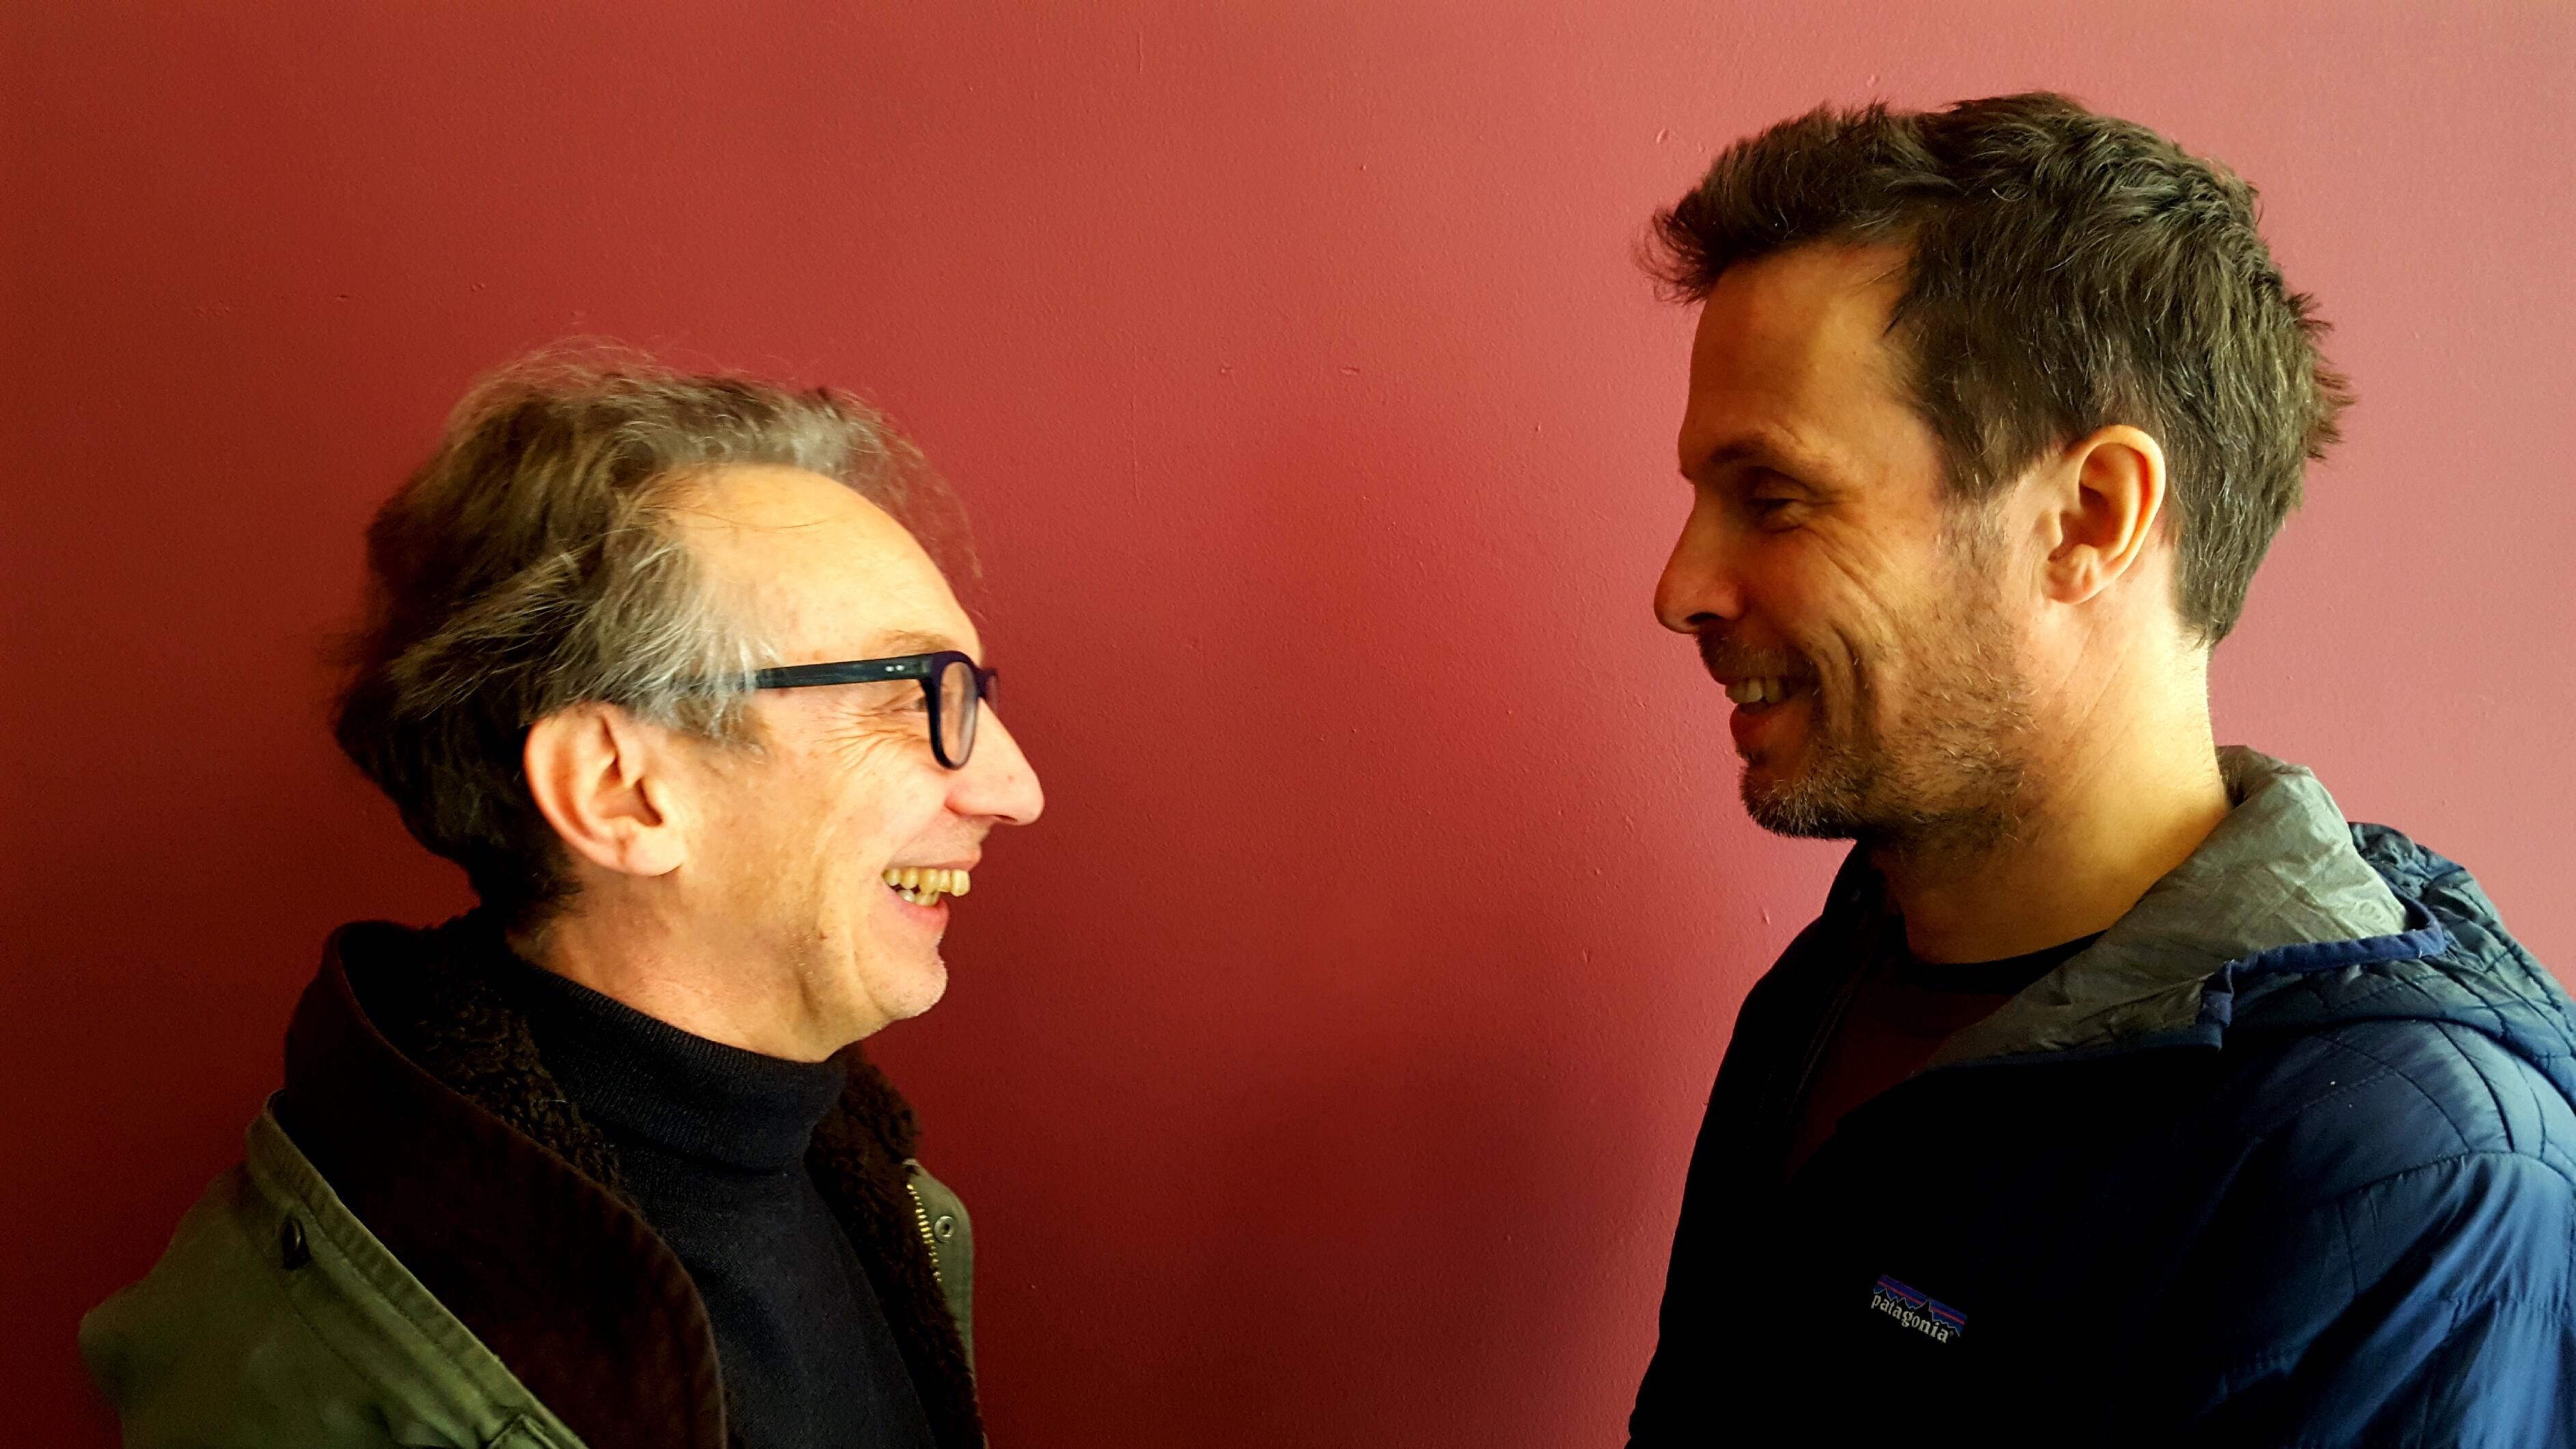 Valerio B. Moser + Andreas Pichler = Miramontefilm